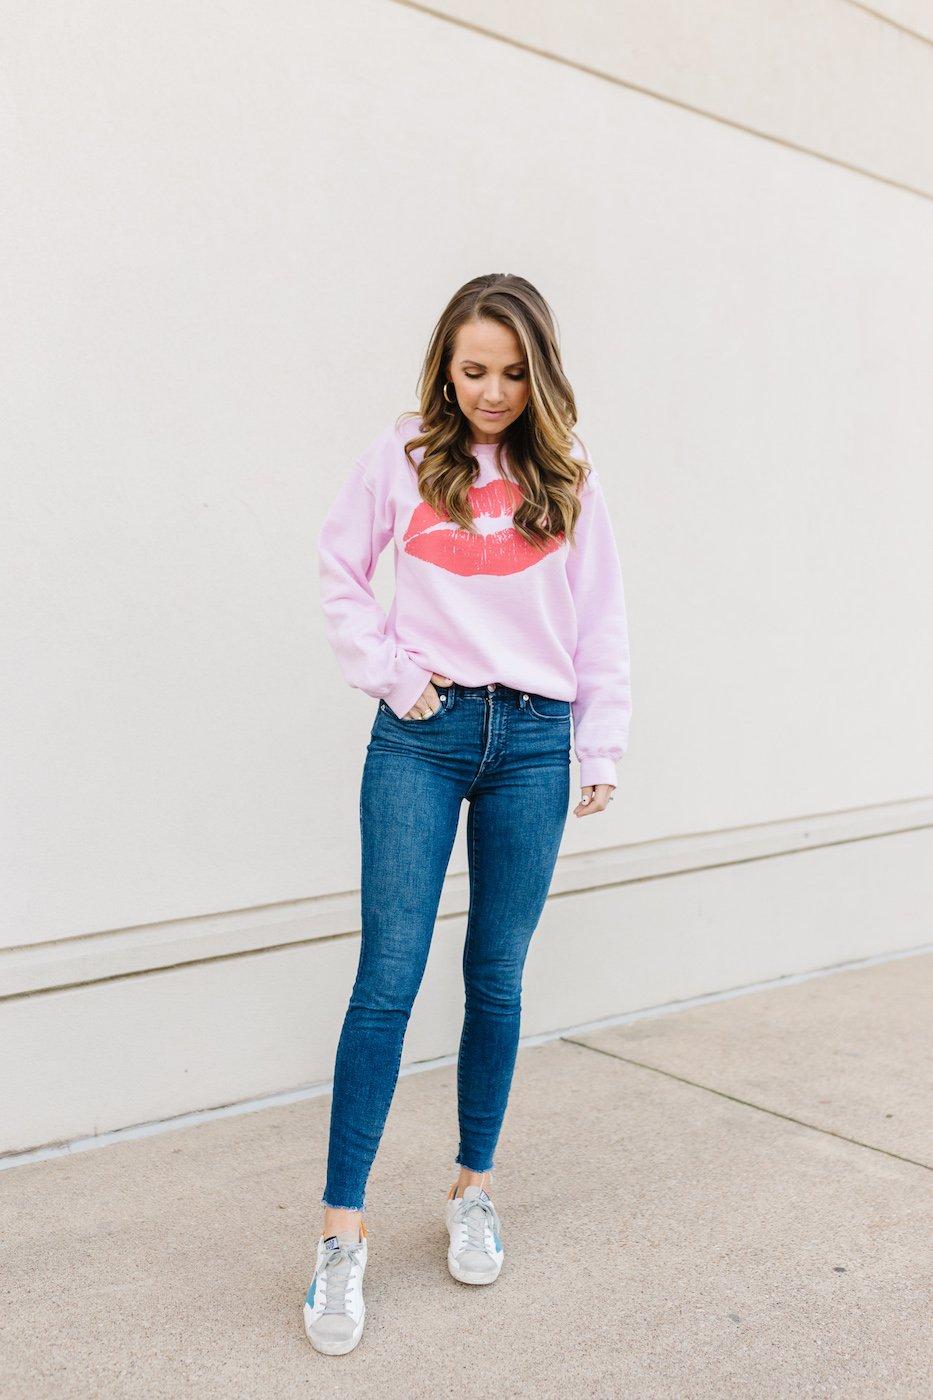 lips sweatshirt - Valentine's Day outfit ideas